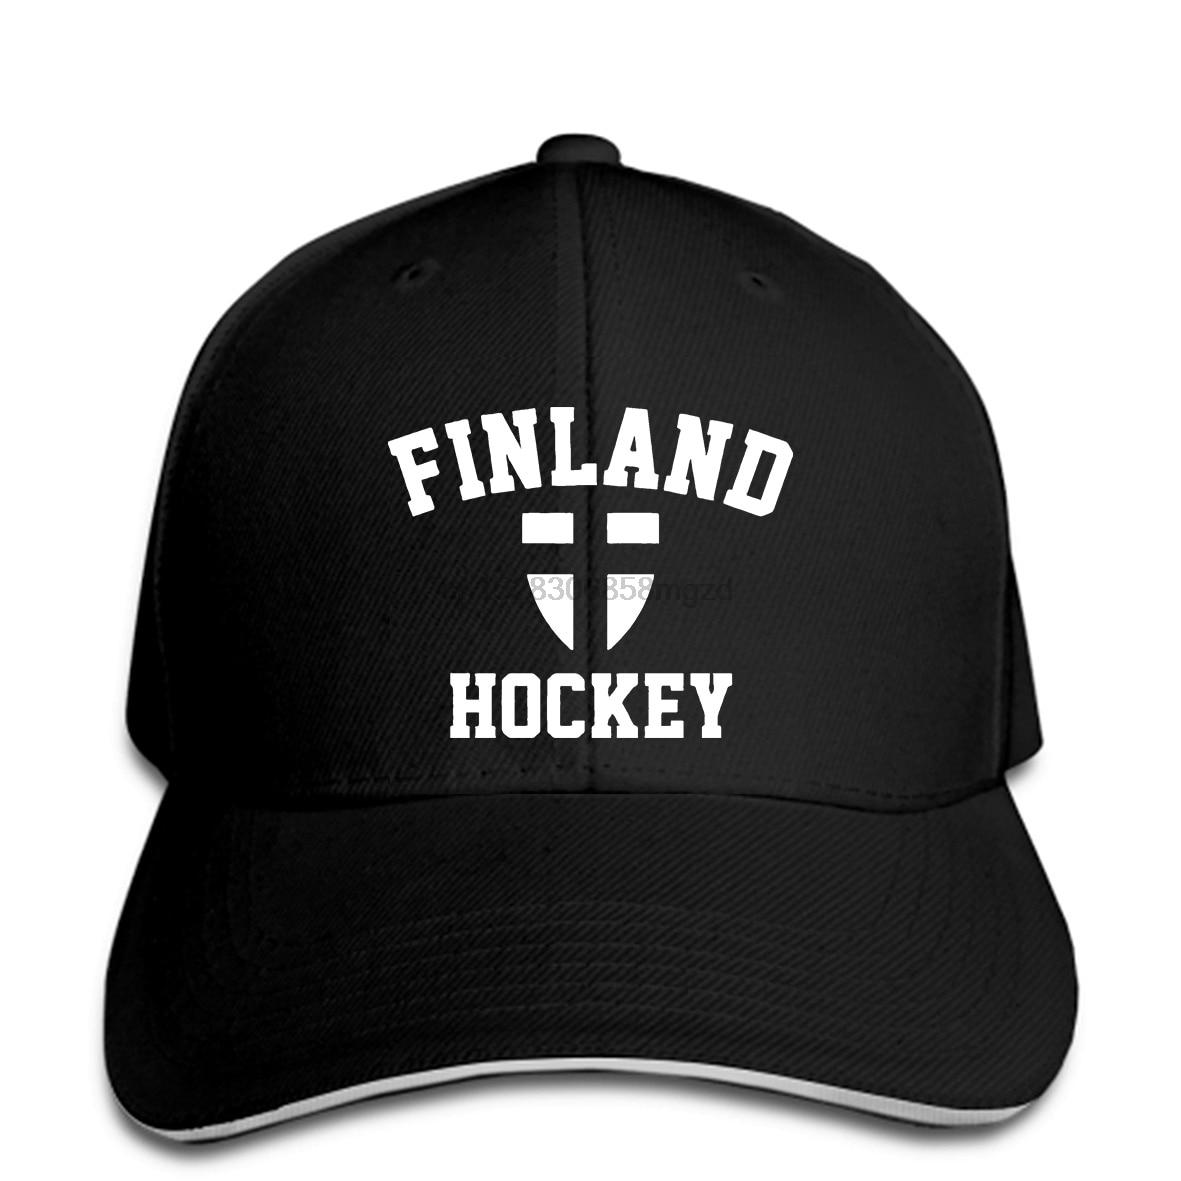 FINLAND HOCKEY Suomi Finnish flagpride team hockey blue jerseyMen Baseball Cap Snapback Cap Women Hat Peaked